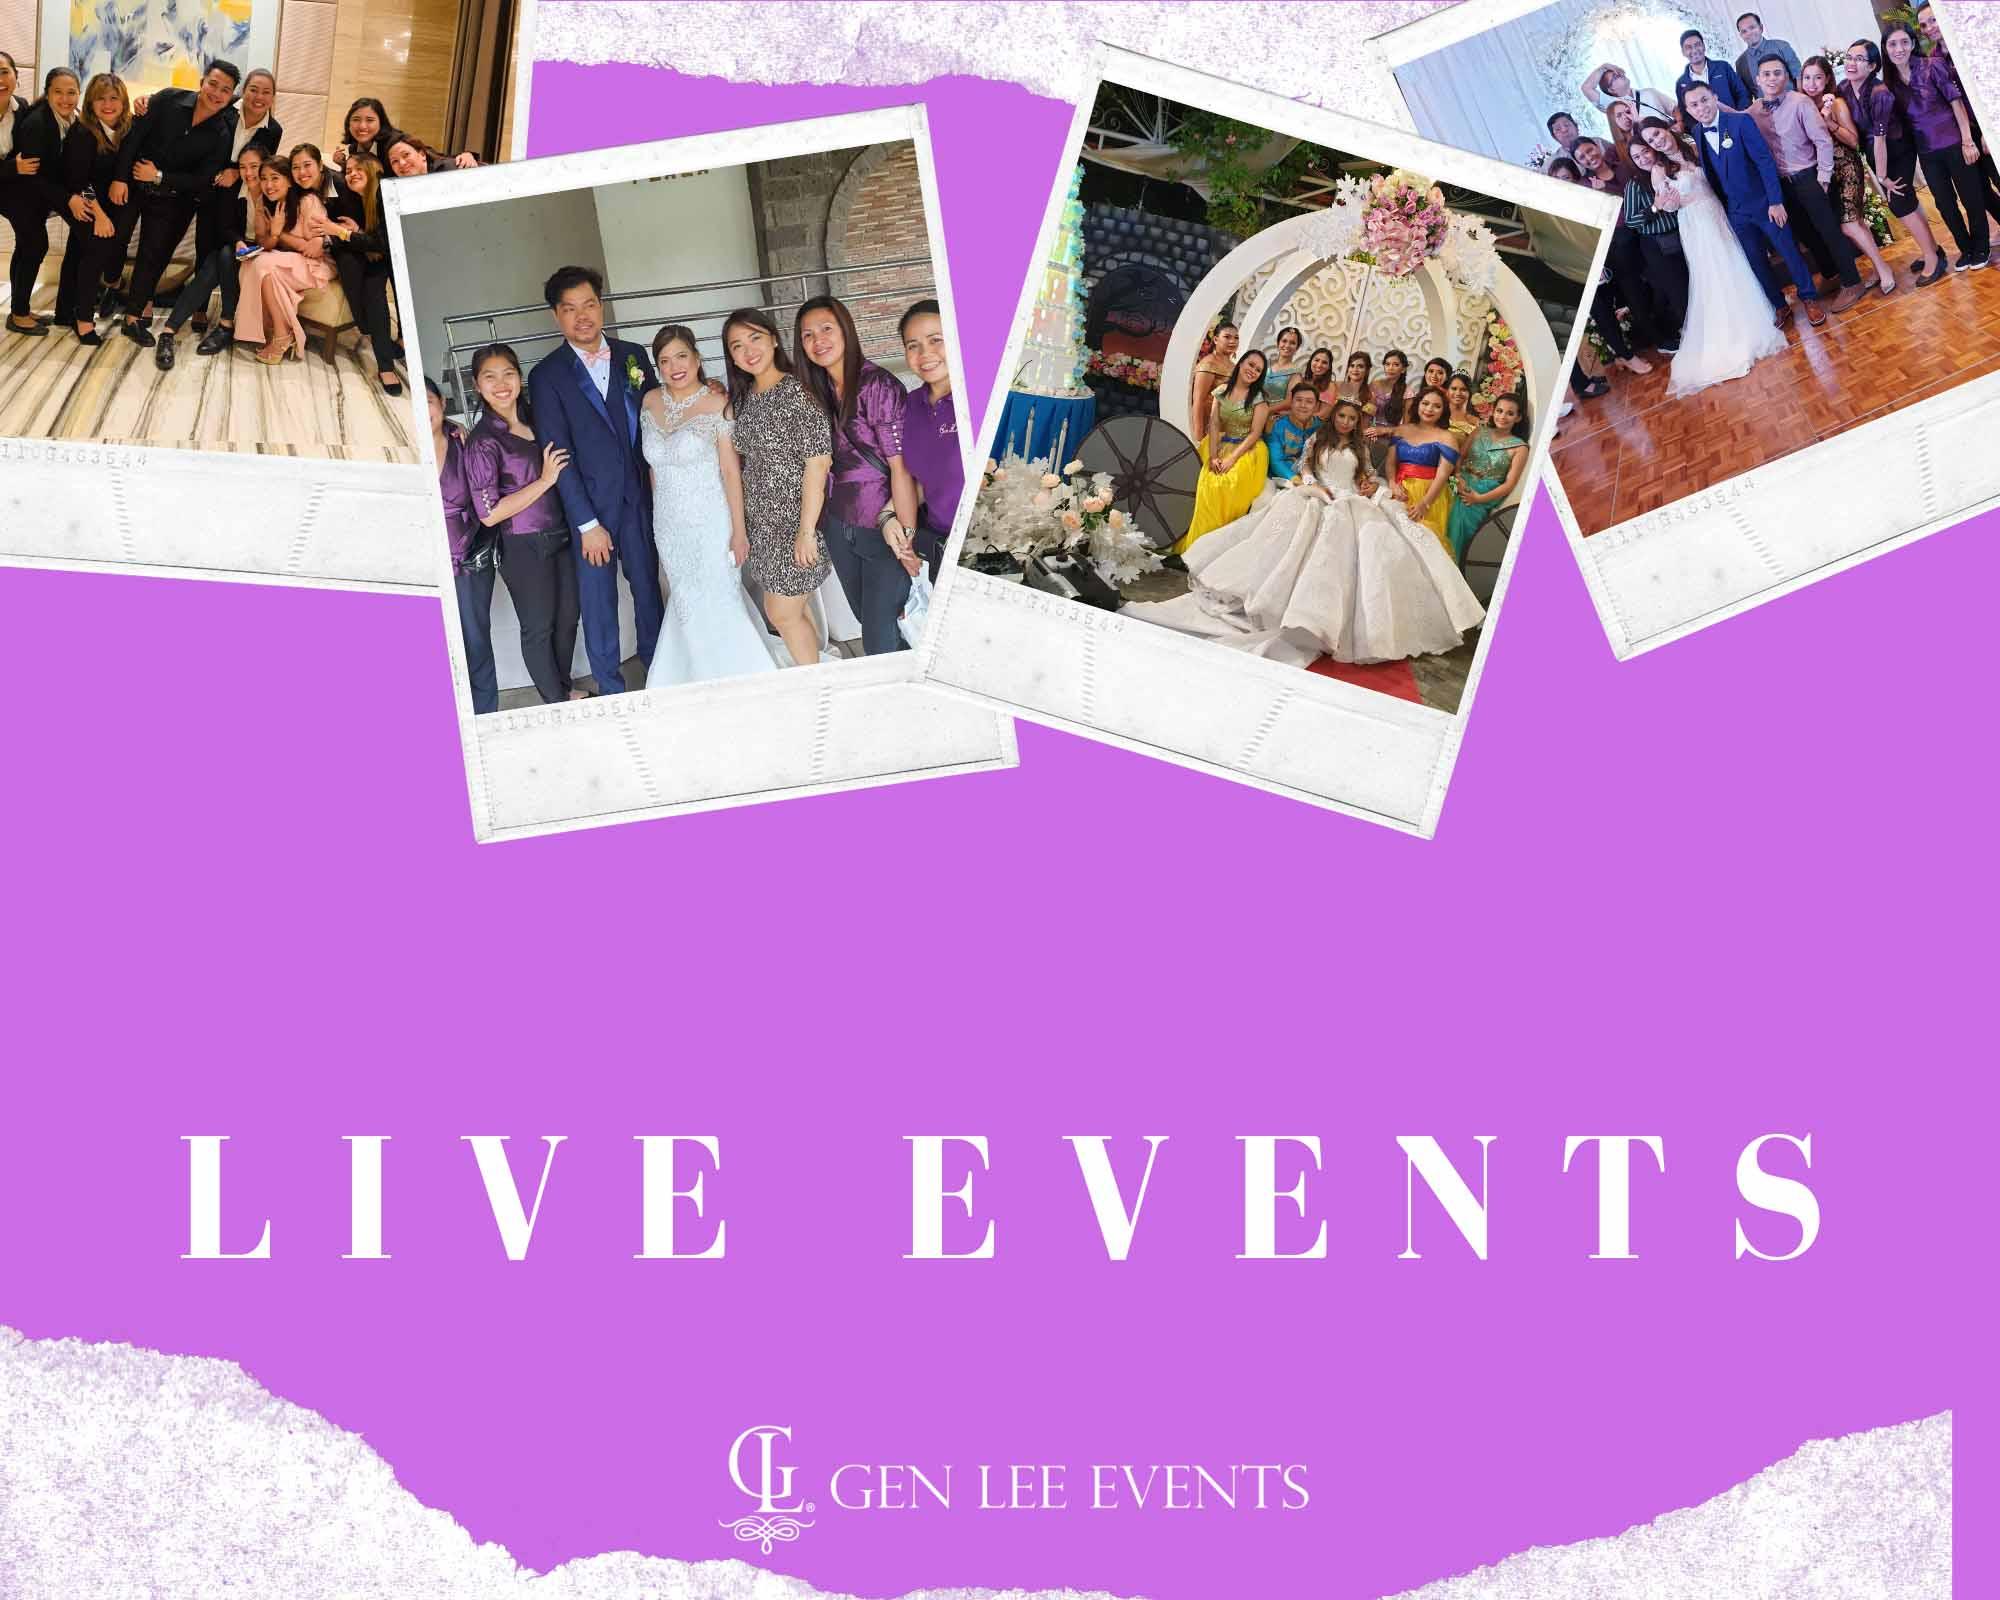 Gen Lee Live Events